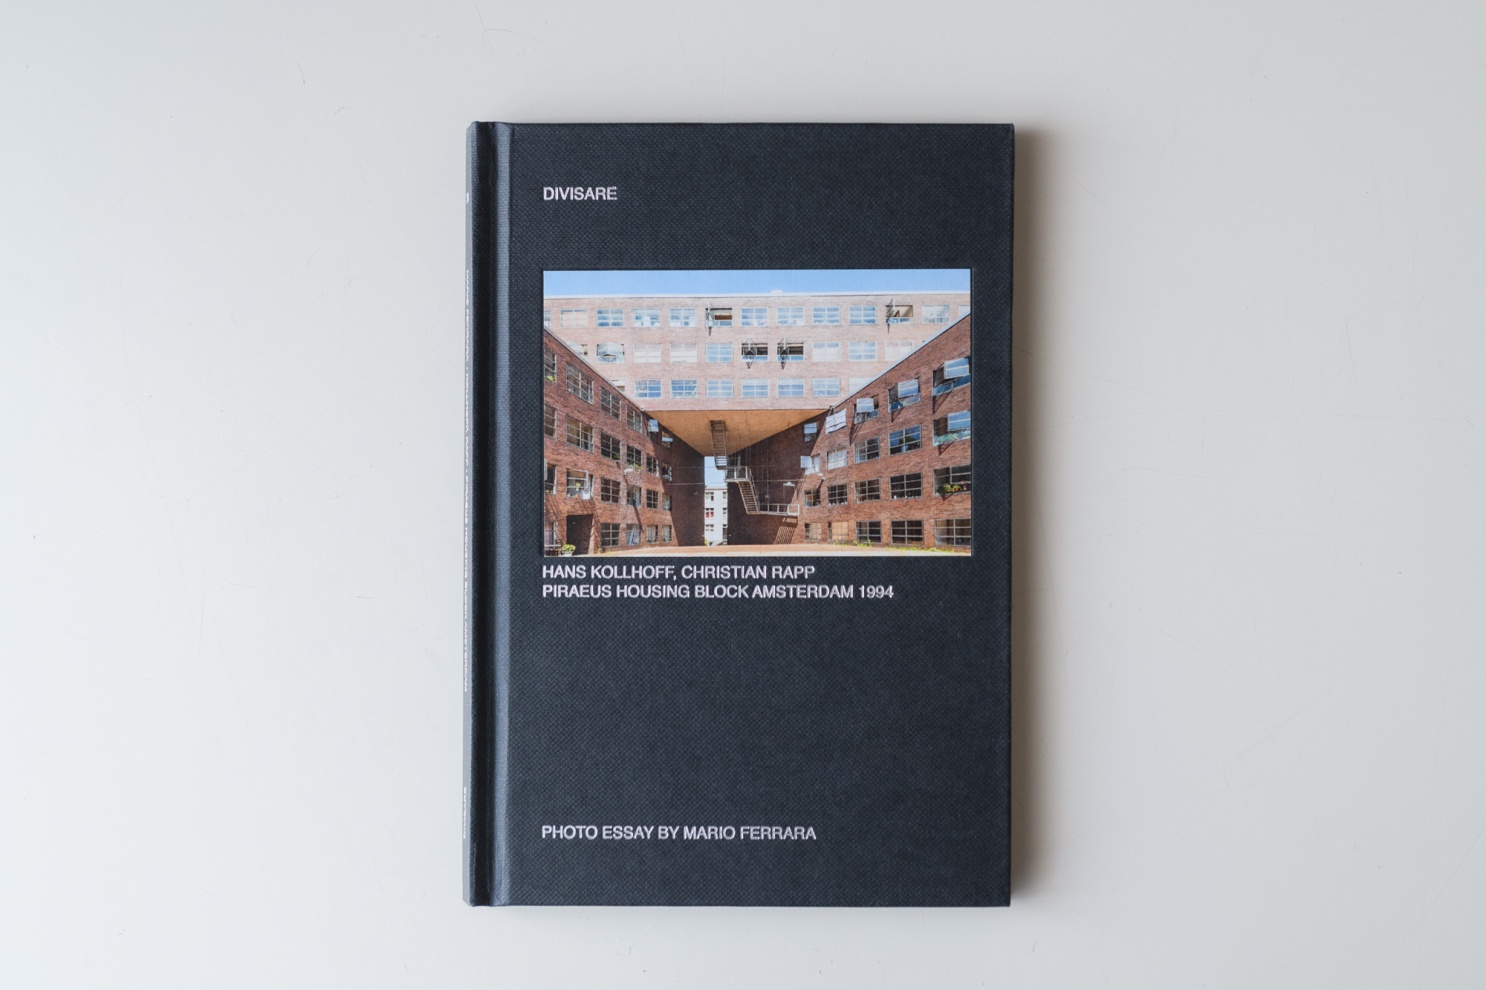 Hans Kollhoff & Christian Rapp<br>Piraeus housing block<br>Amsterdam 1994